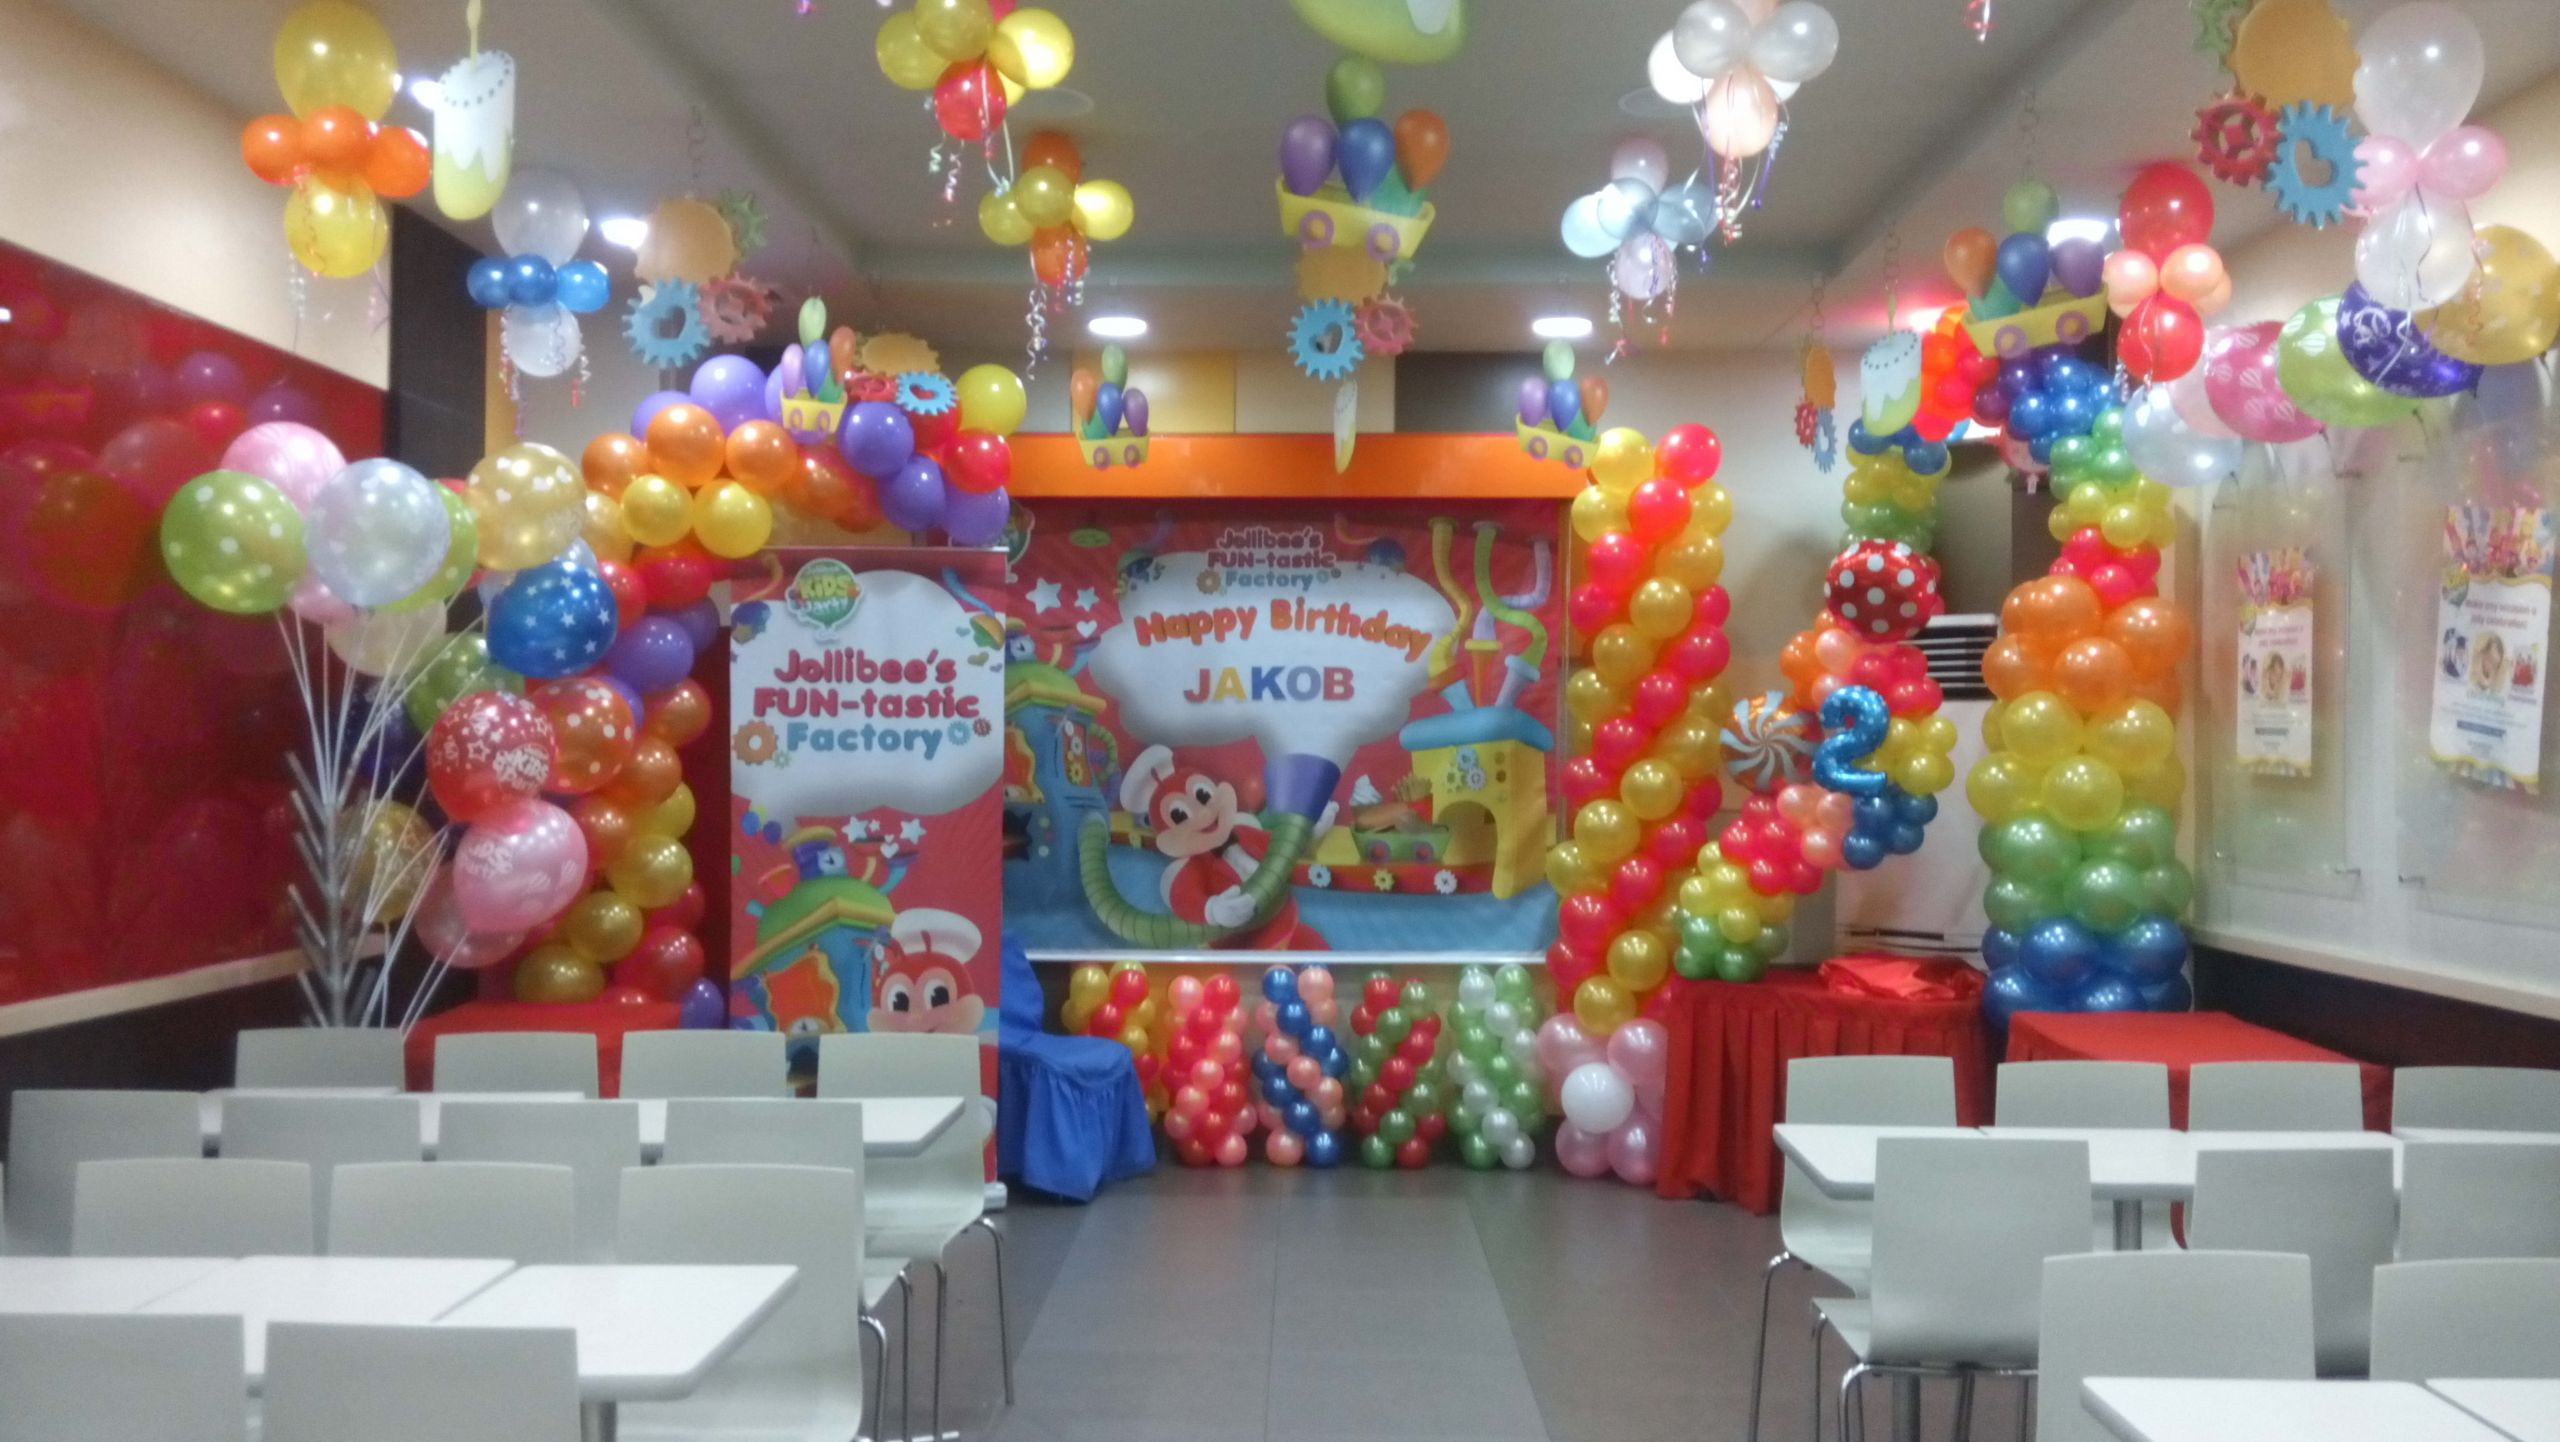 Jollibee Kids Party  jakob's 2nd birthday celebration jollibee SM Marikina